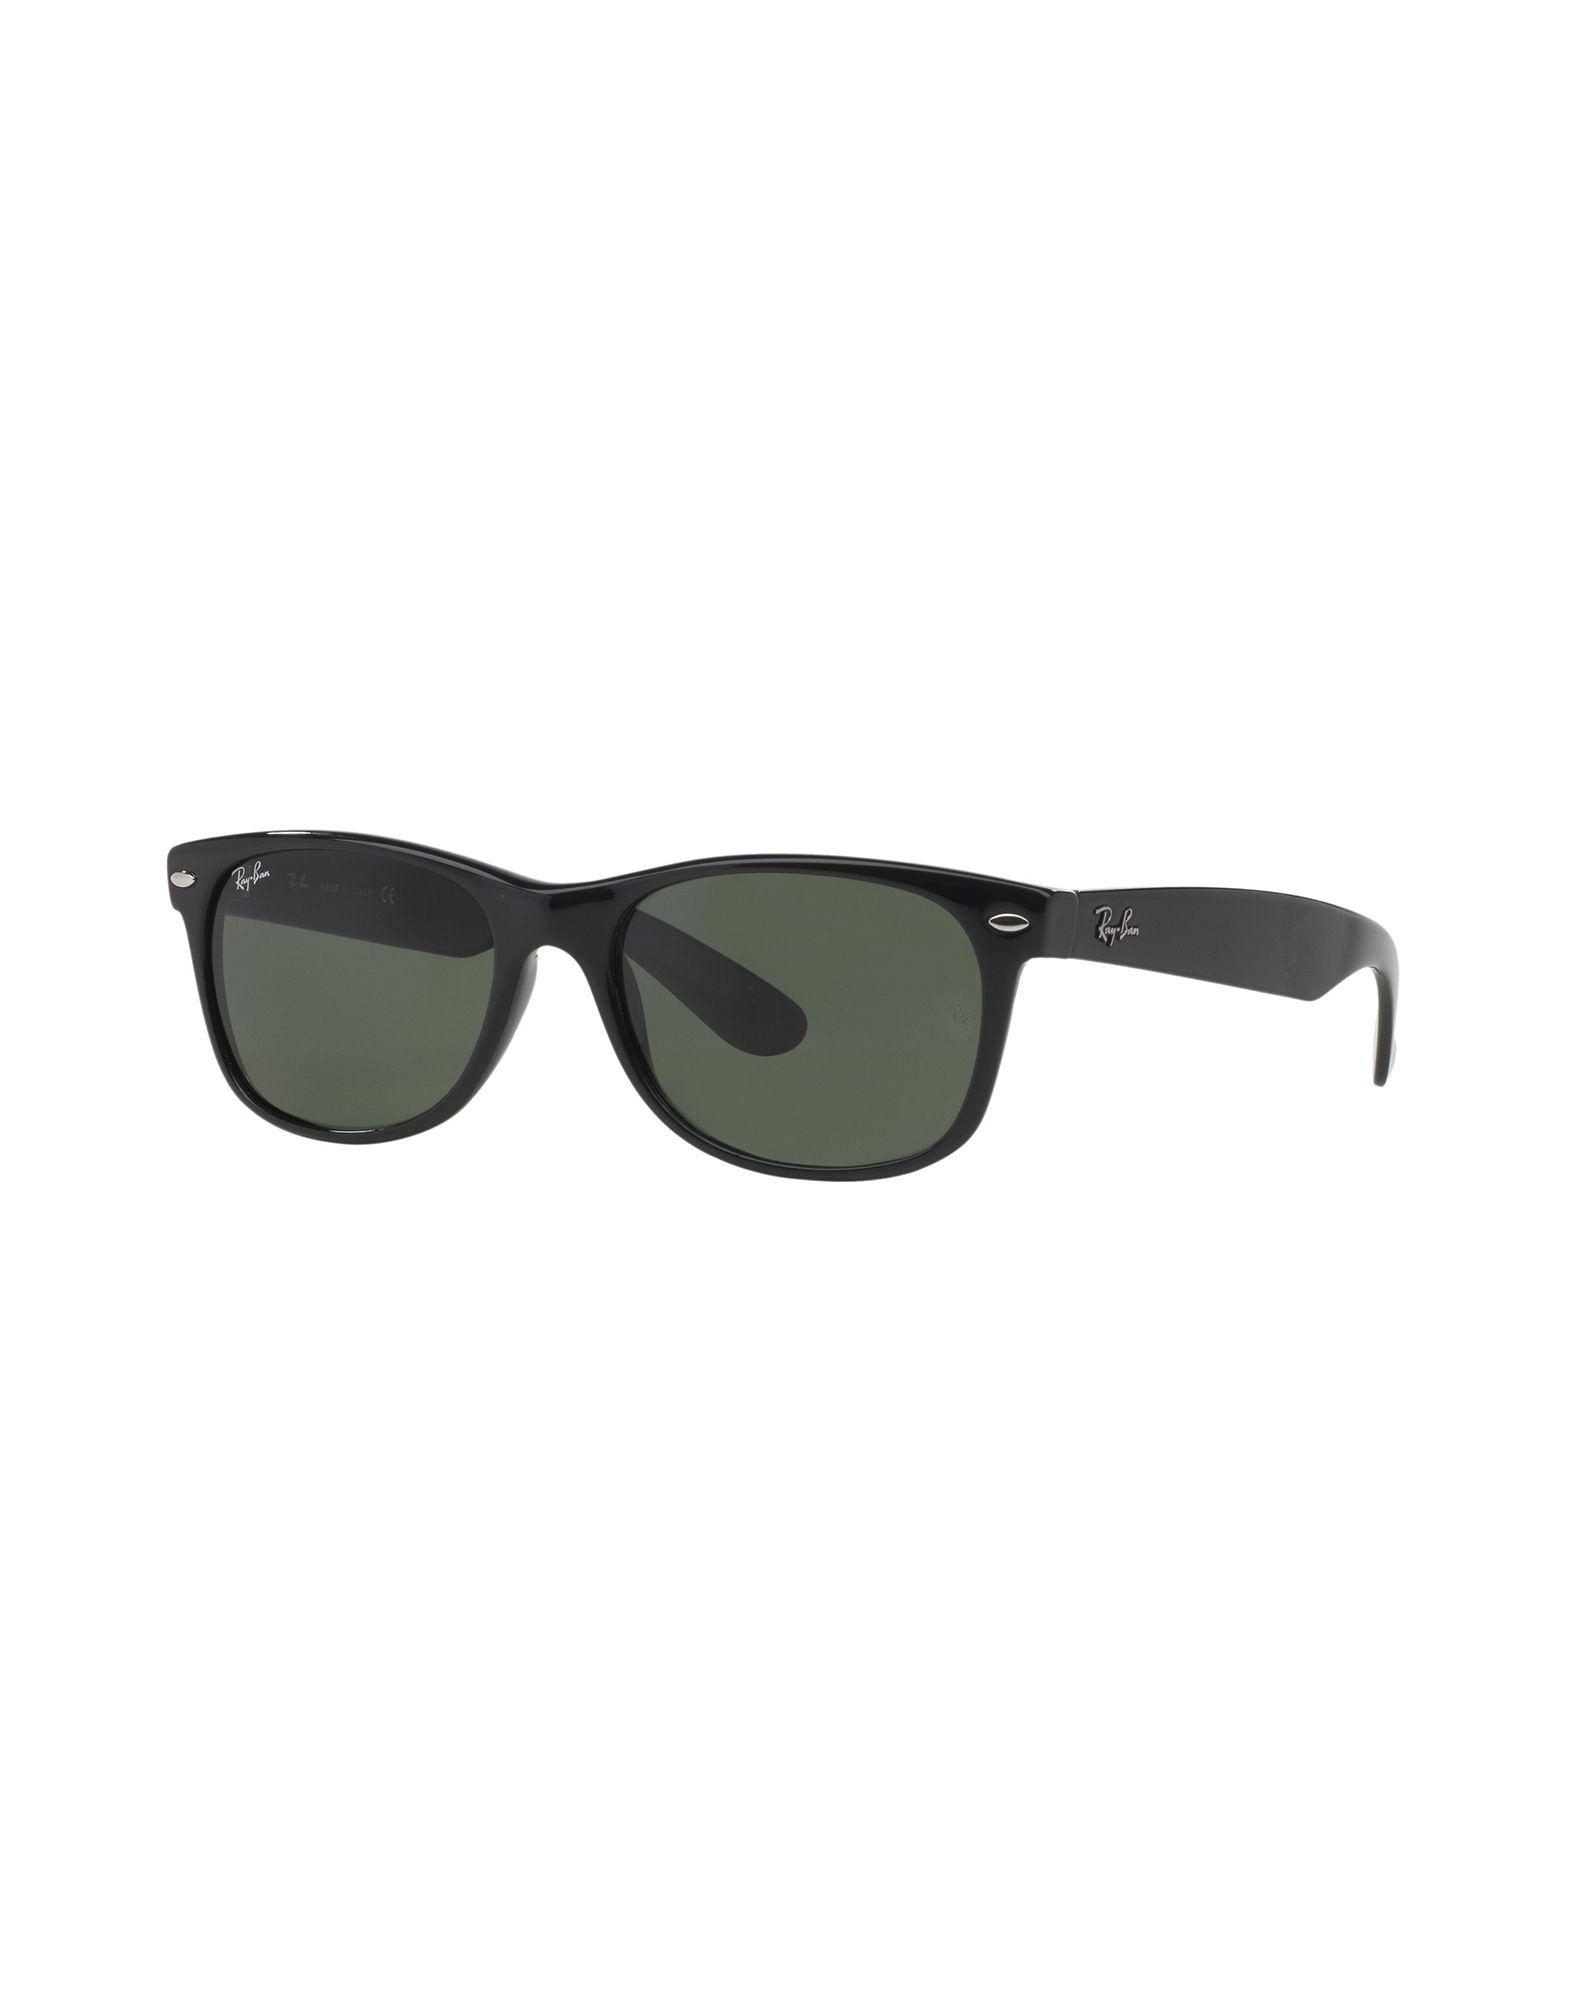 Occhiali Da Sole Ray-Ban Rb2132 New Wayfarer - Uomo - Acquista online su